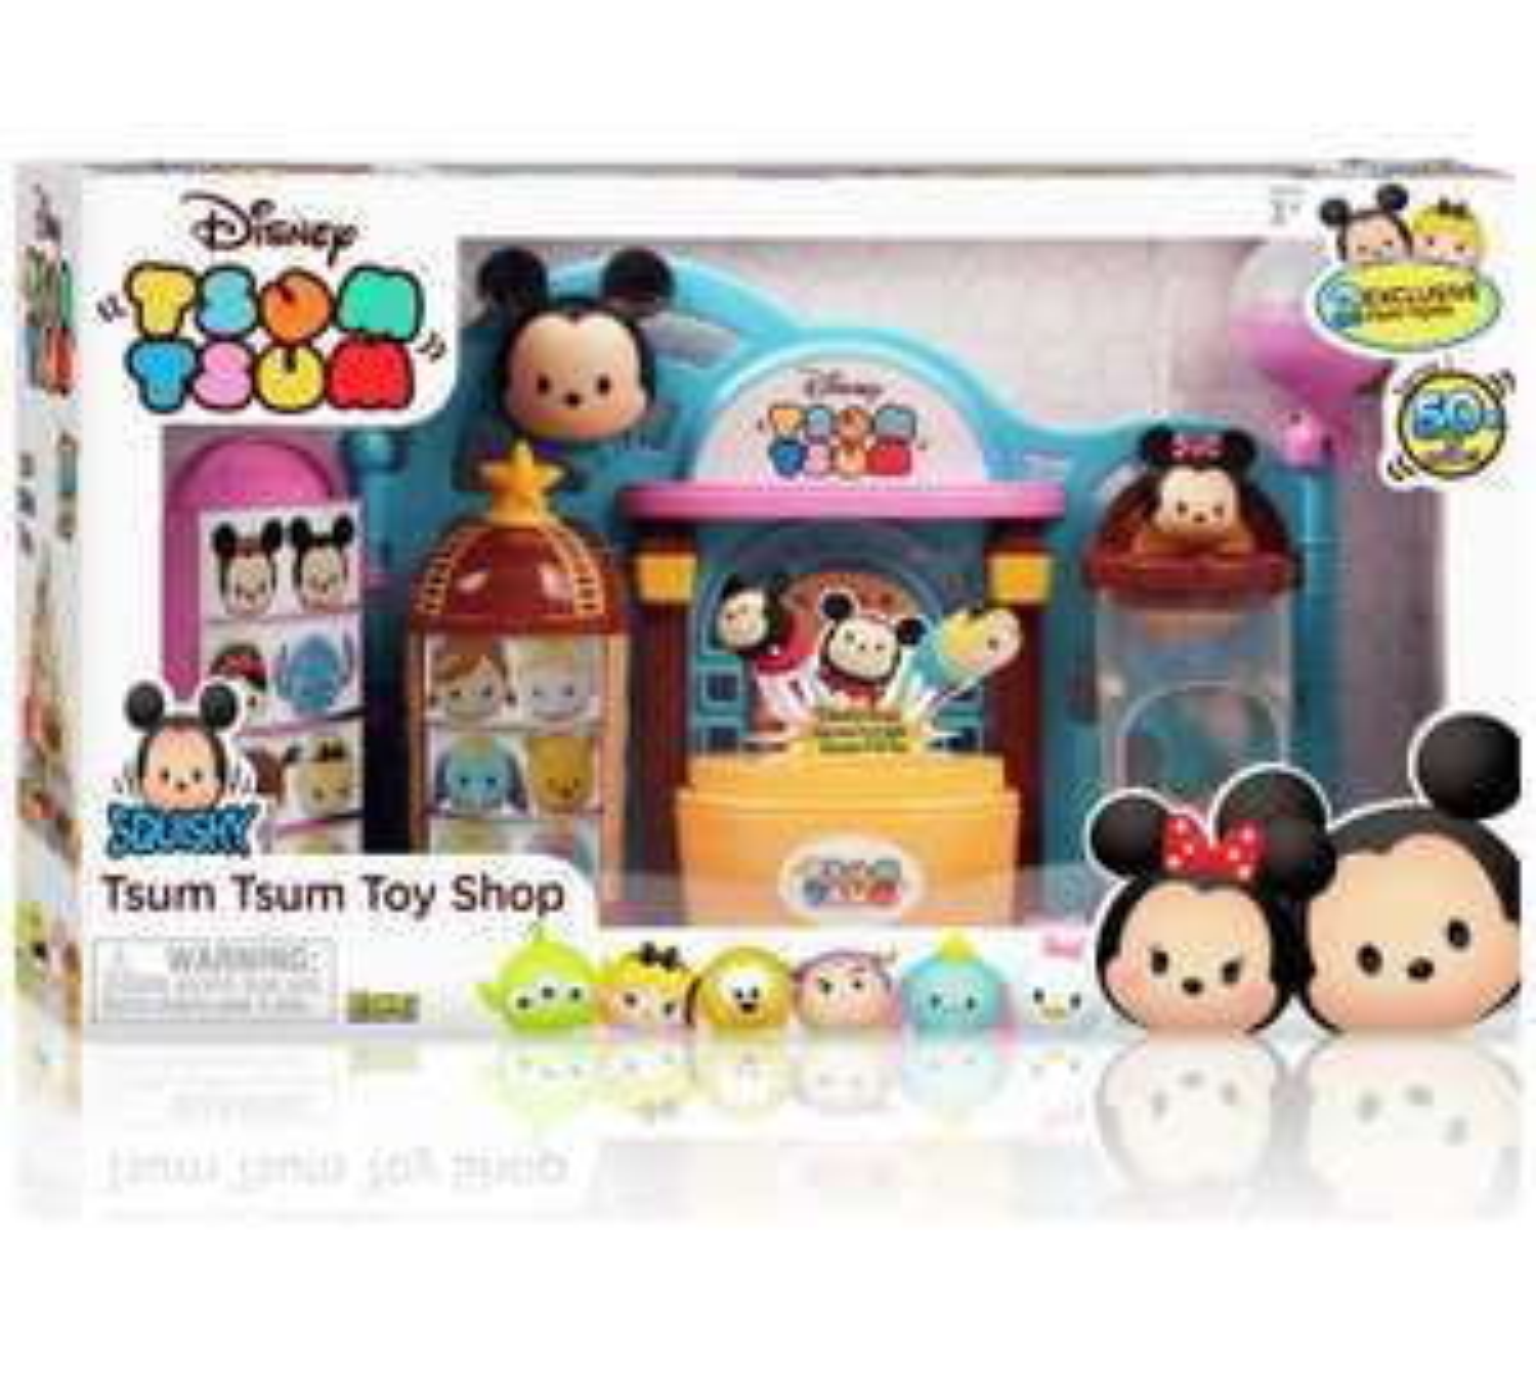 Disney Tsum Tsum Playset £6.99 @ argos